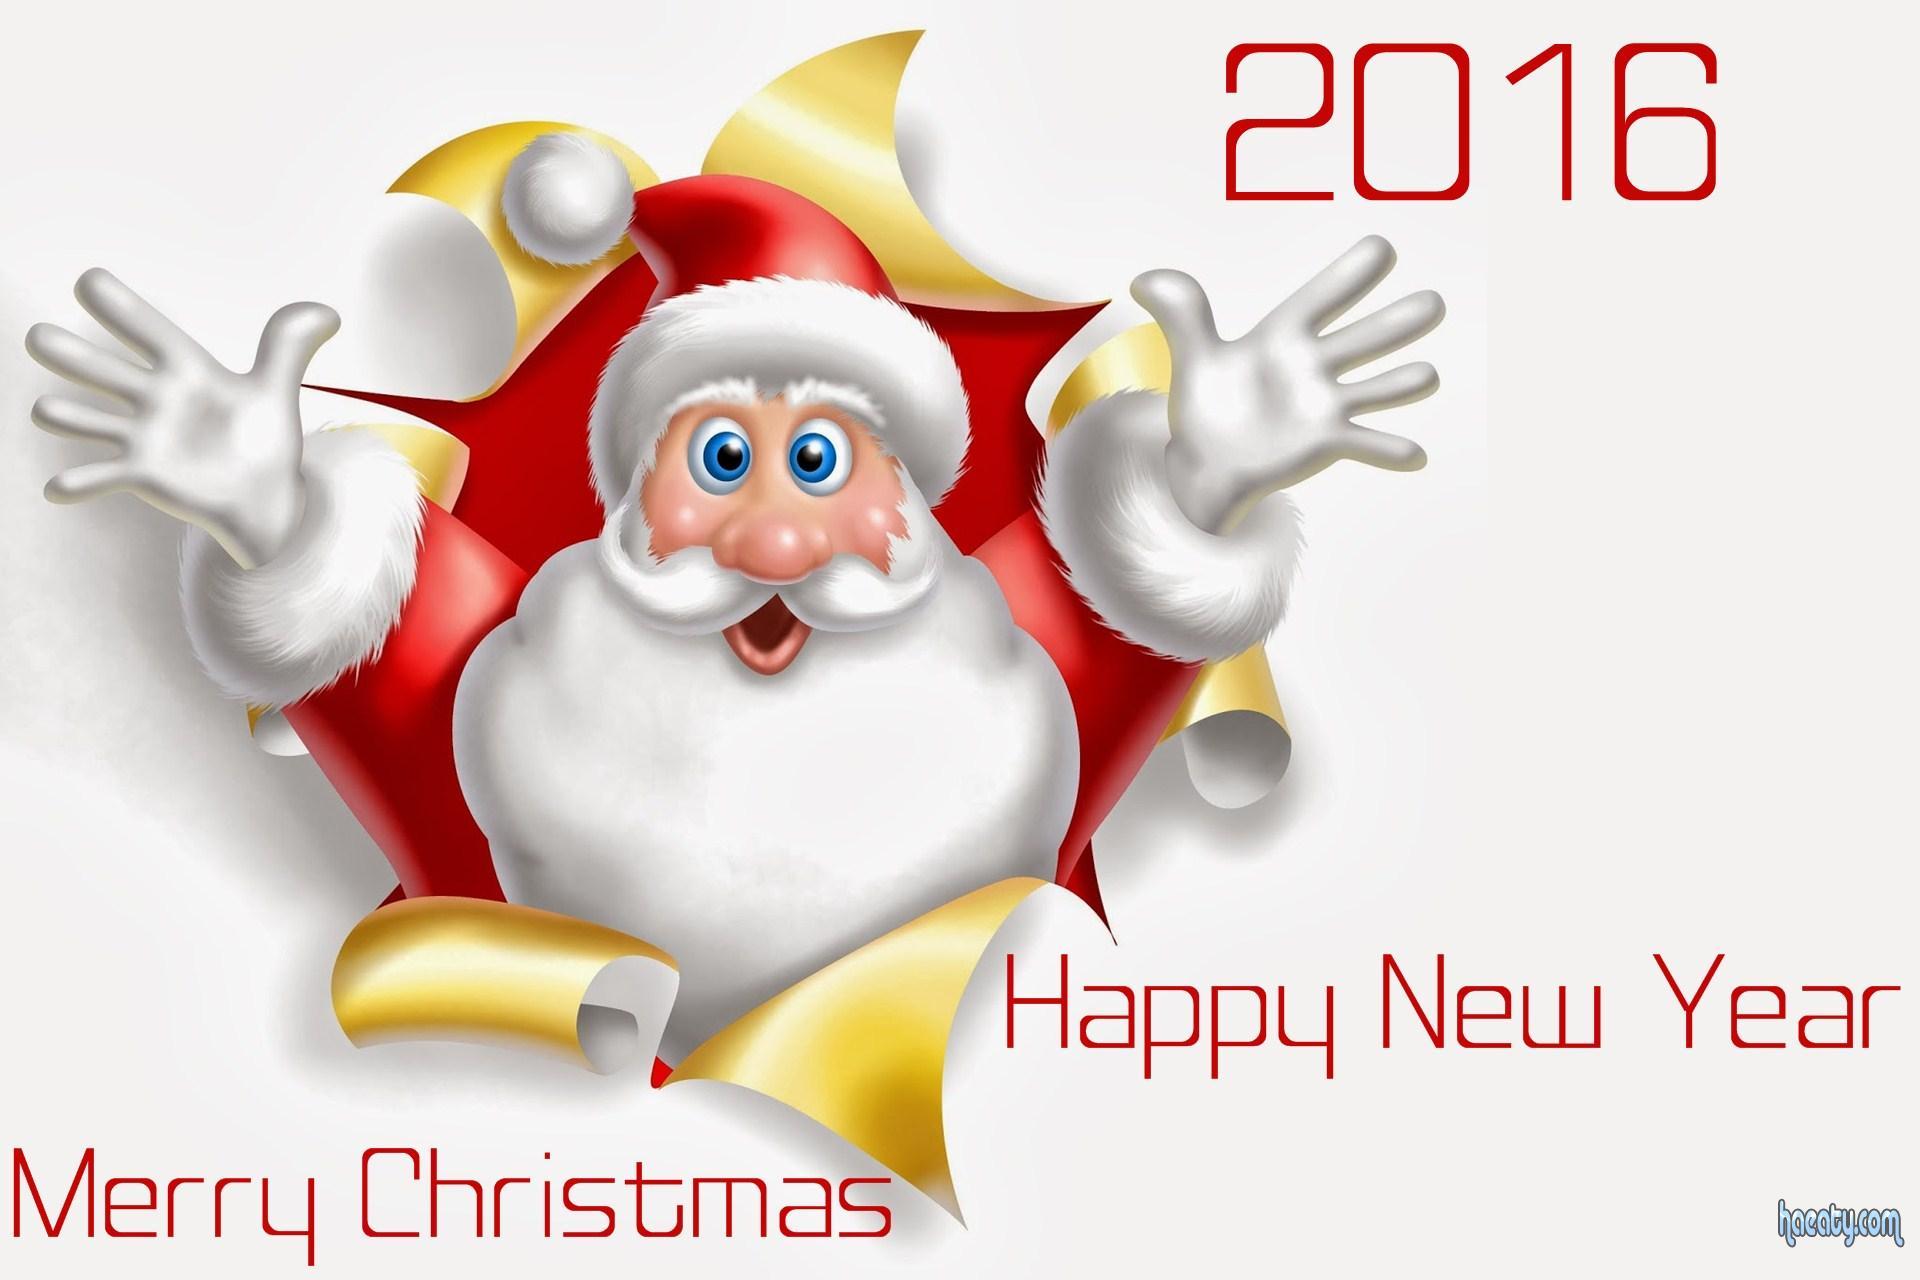 الكريسماس 2016-Merry-Christmas-and-Happy-new-year-2016 1450540305951.jpg